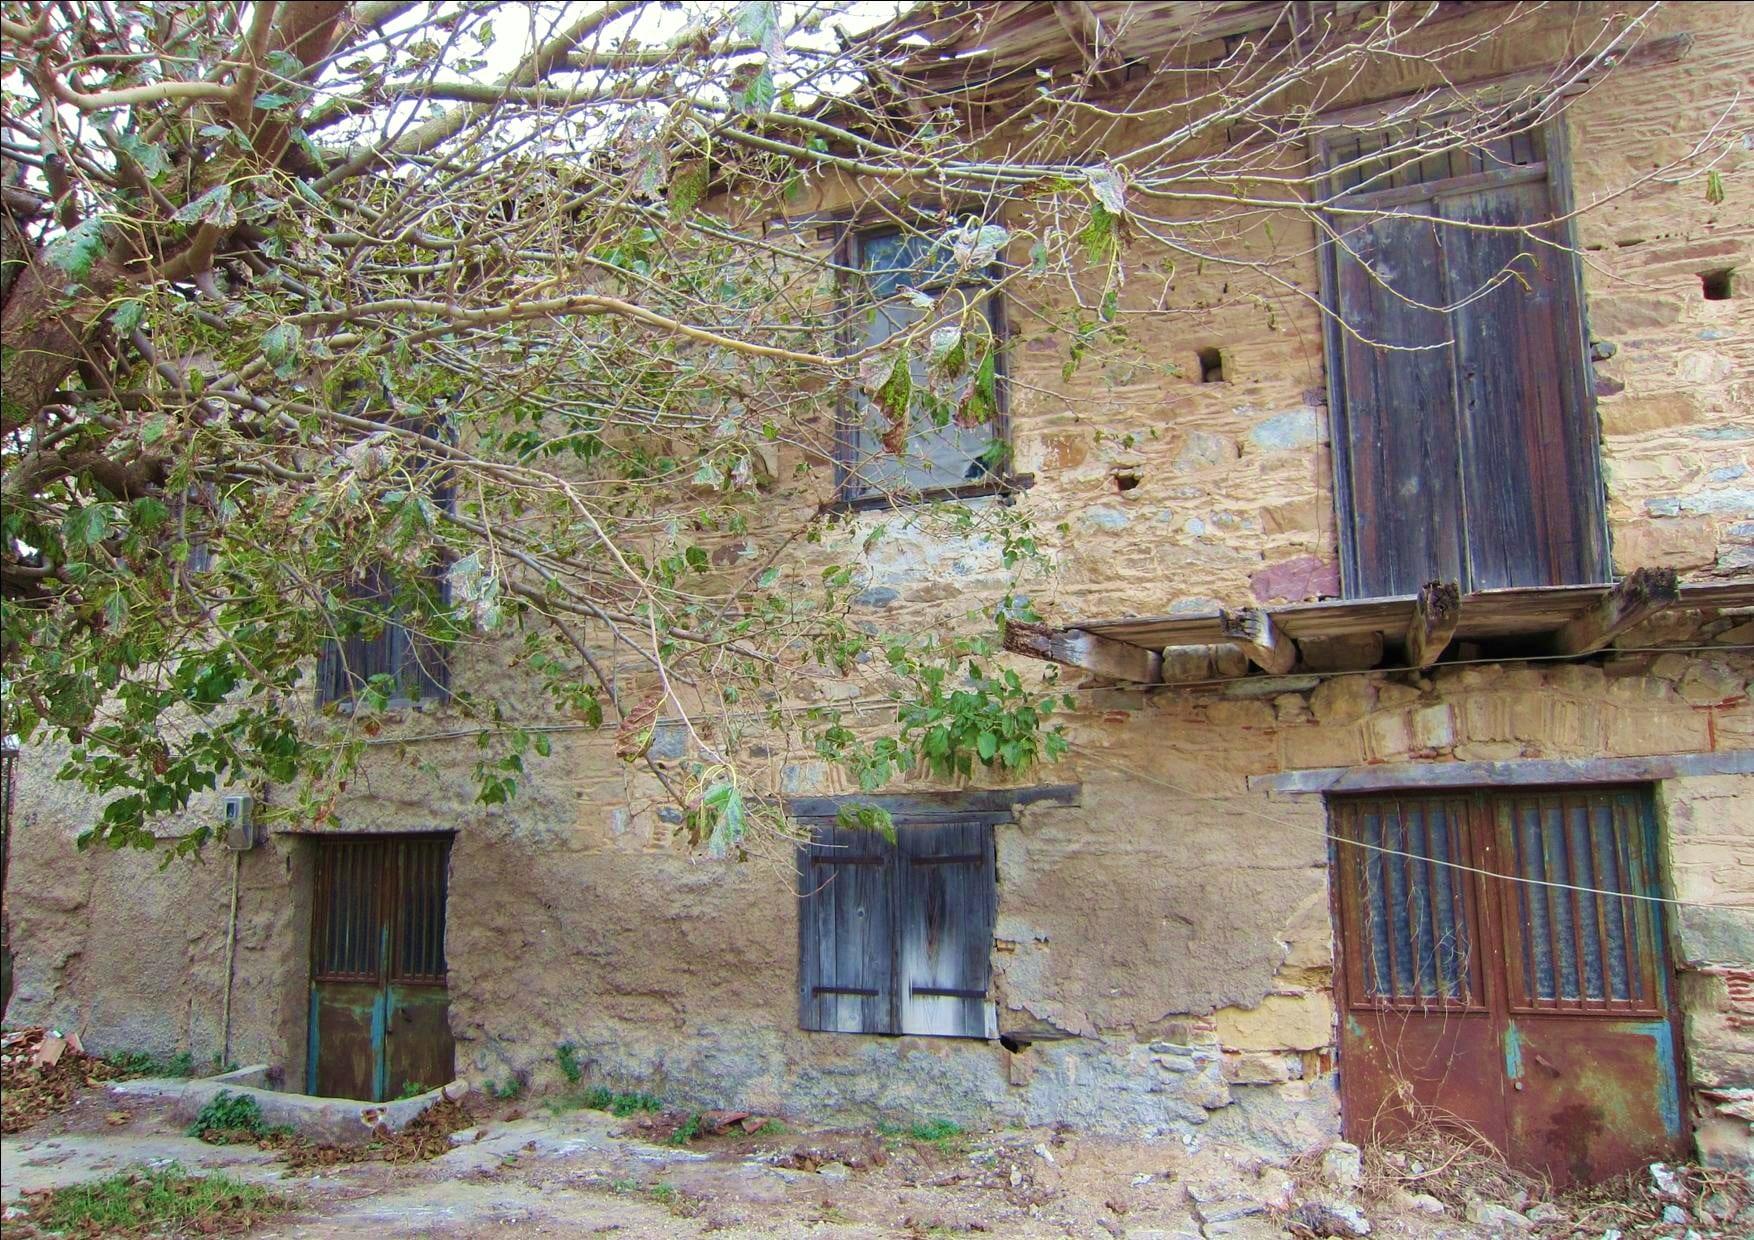 Evia old stone renovation house near beach